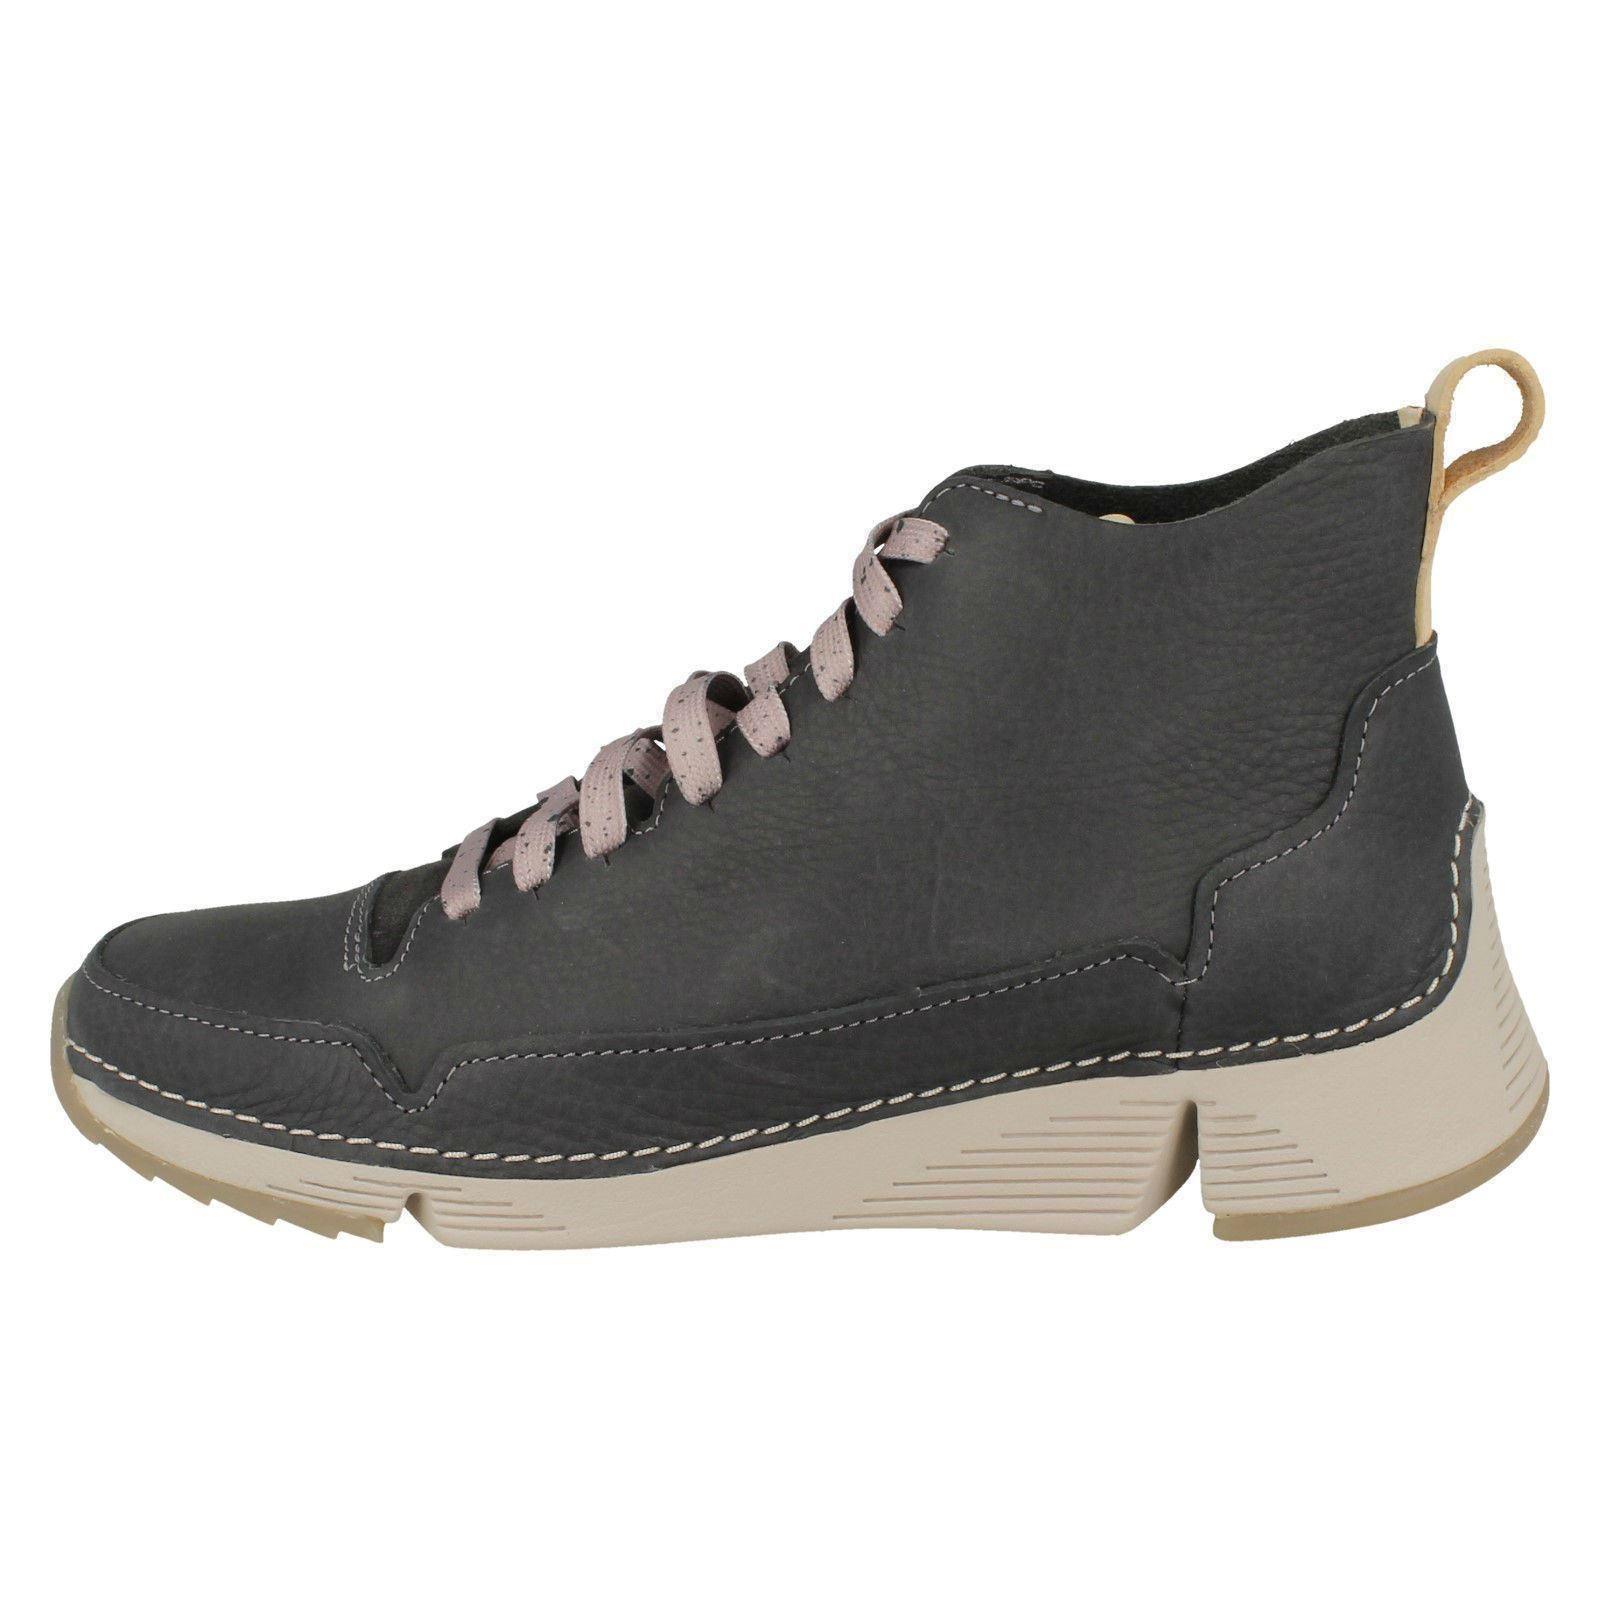 Tri Gratis Trigenic Clarks Mujer Mujer Mujer Cuero Deportivo Zapatillas Ocasional Cordones a4a761